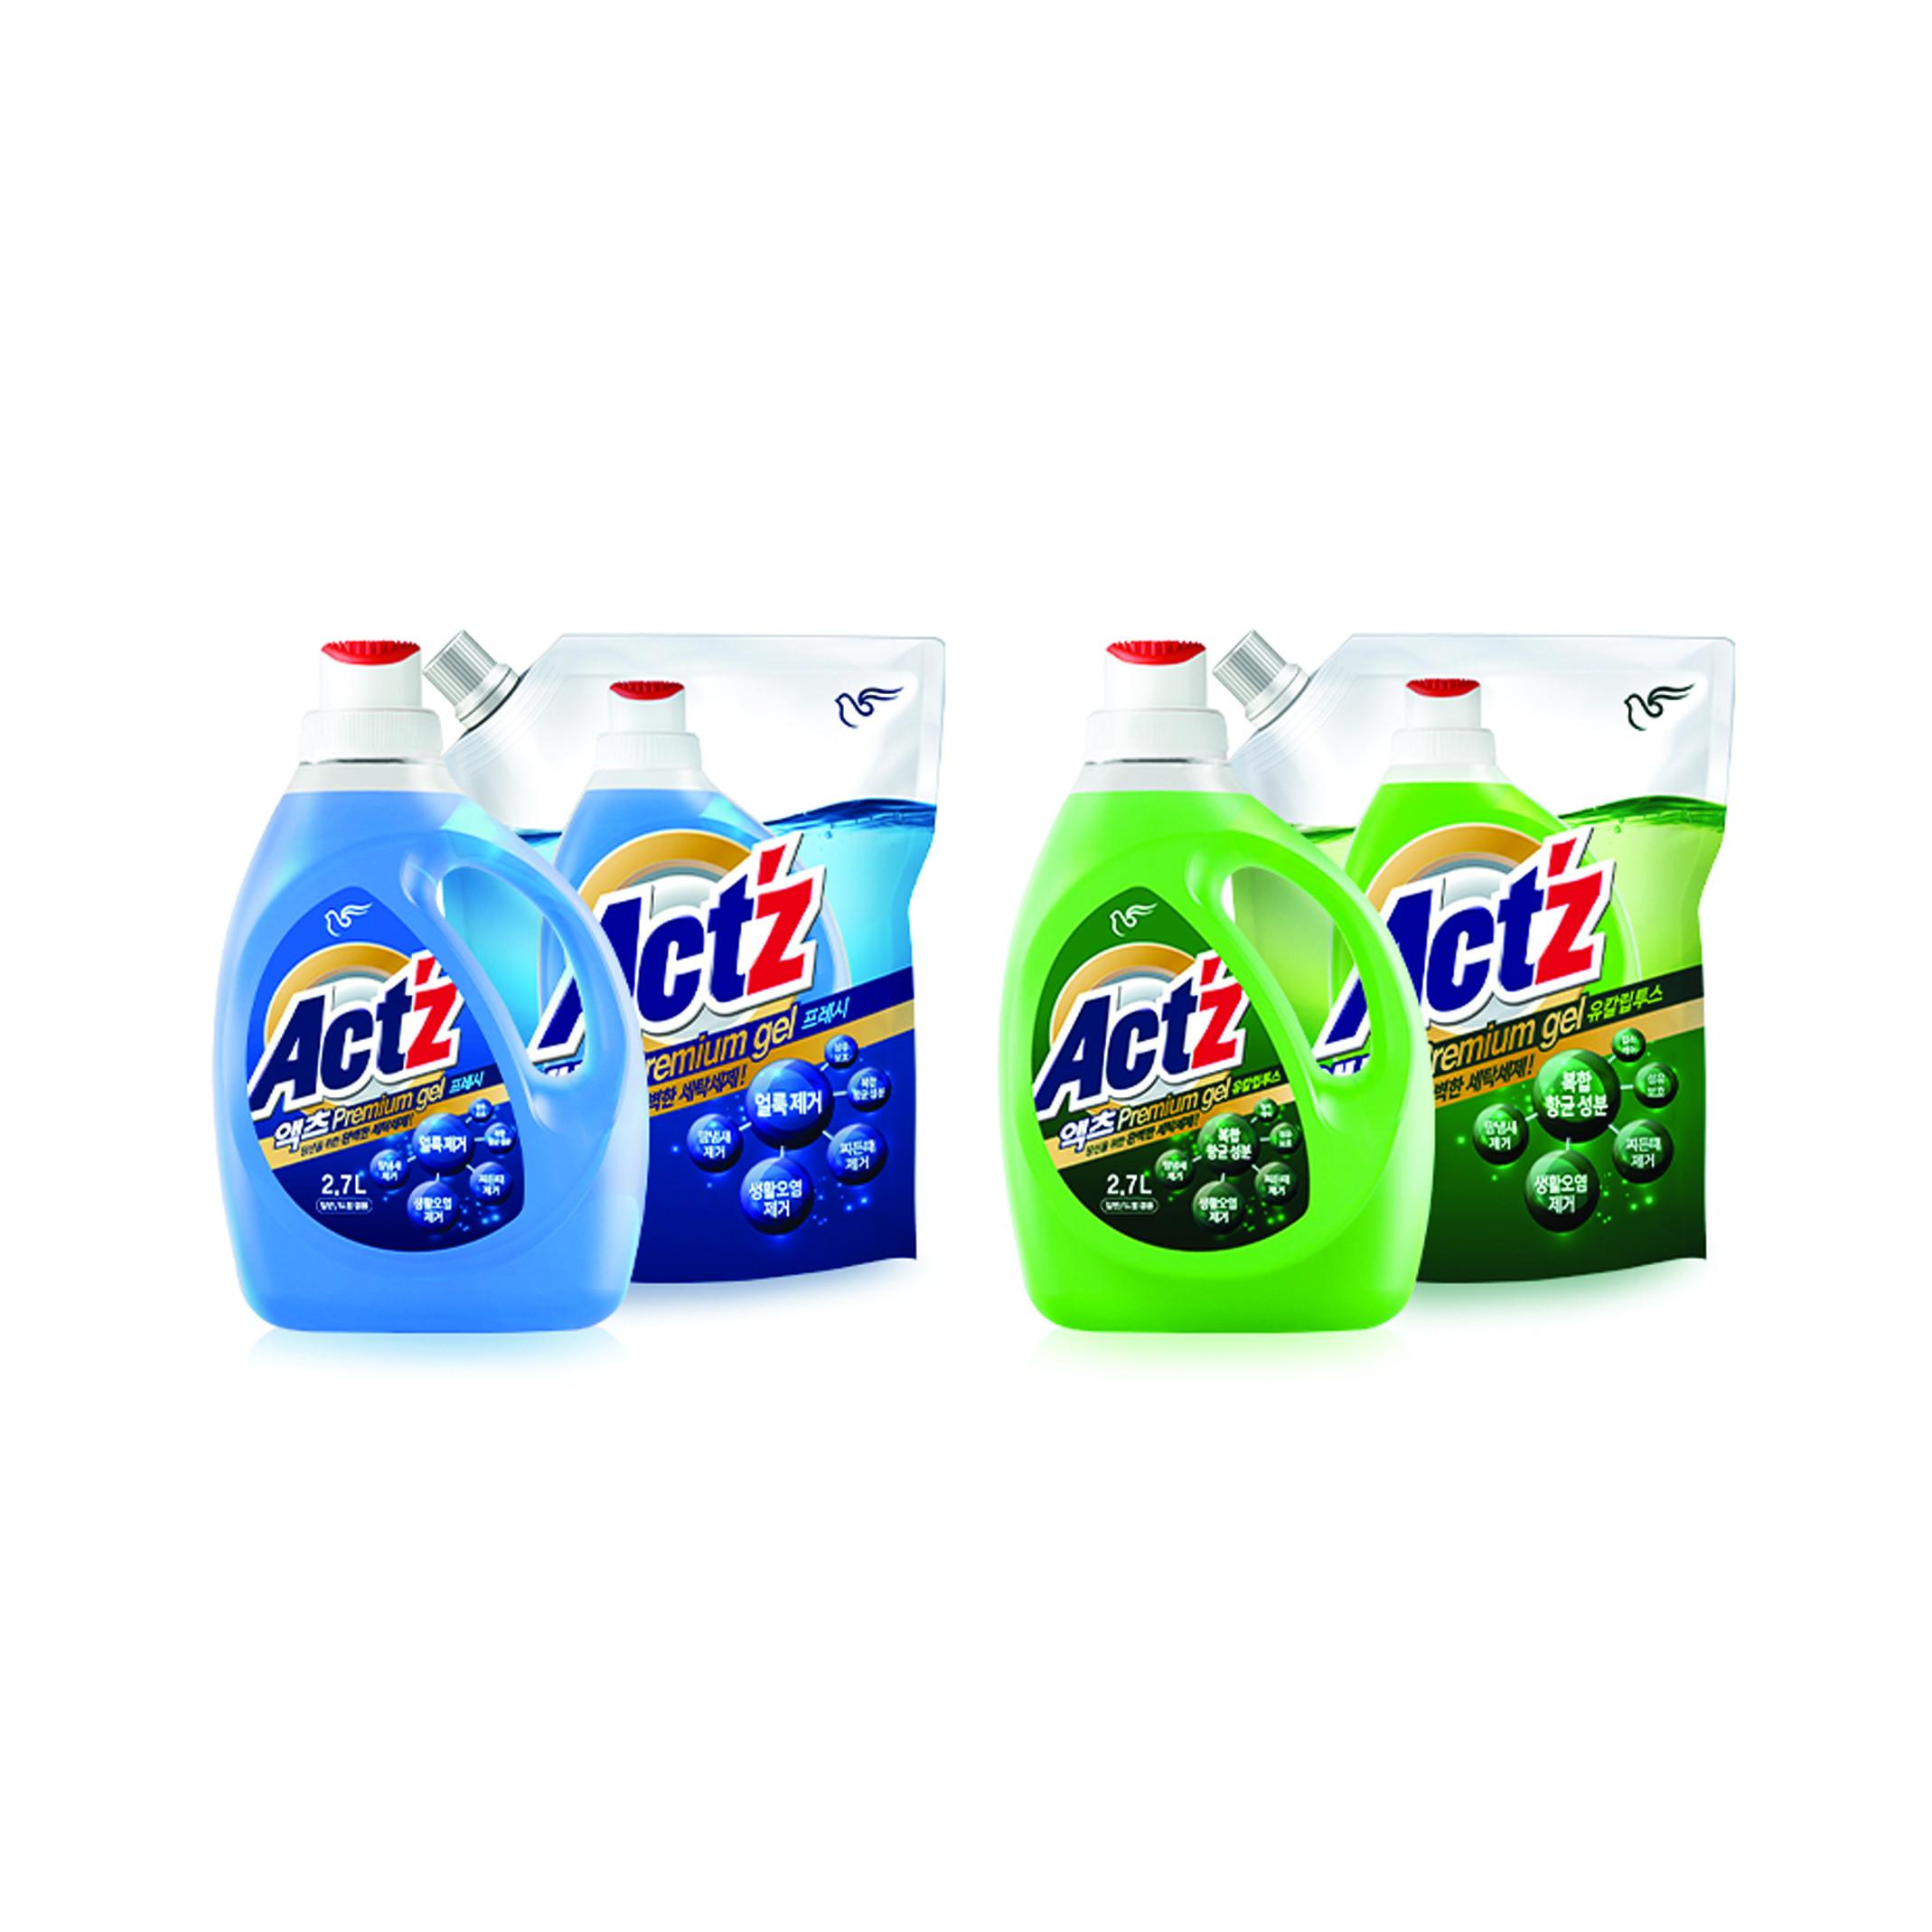 Nước giặt cao cấp PIGEON ACT'Z Premium Gel Hàn Quốc chai 2.7L